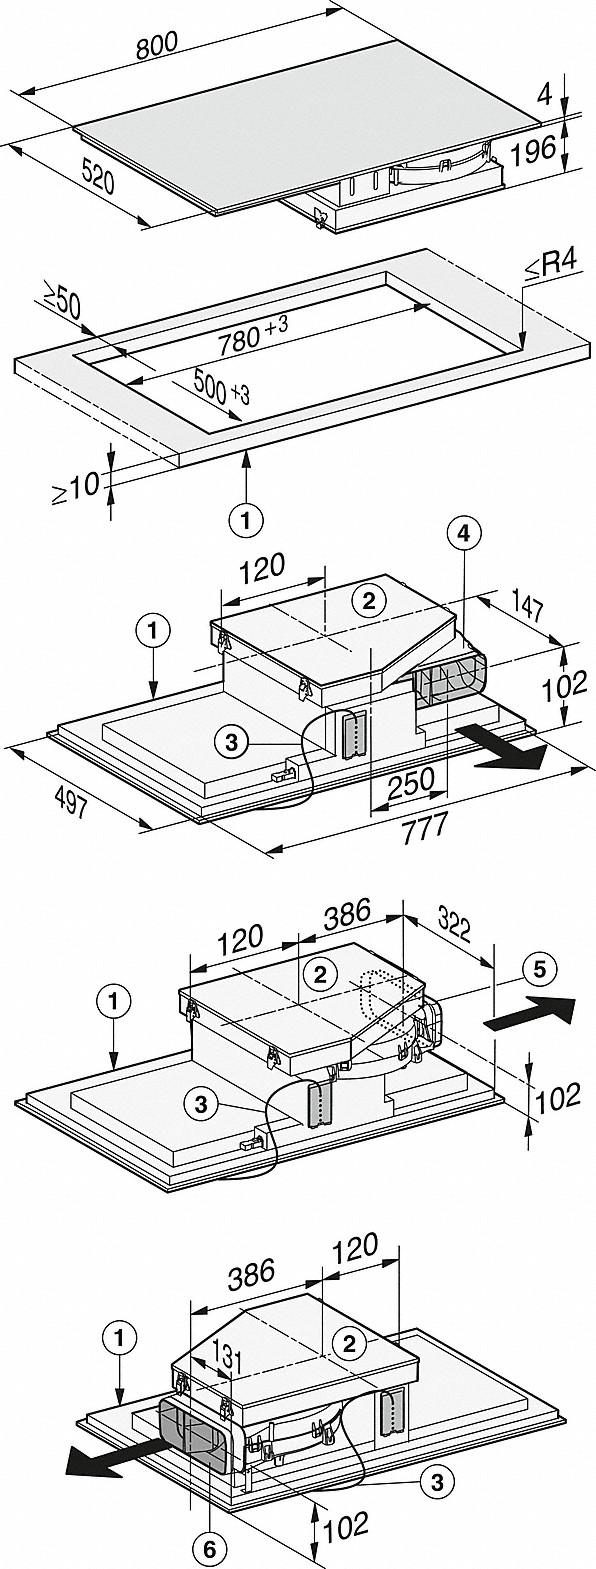 -s dva PowerFlex područja za kuhanje i jednim centralnim odvodom pare-20000133038